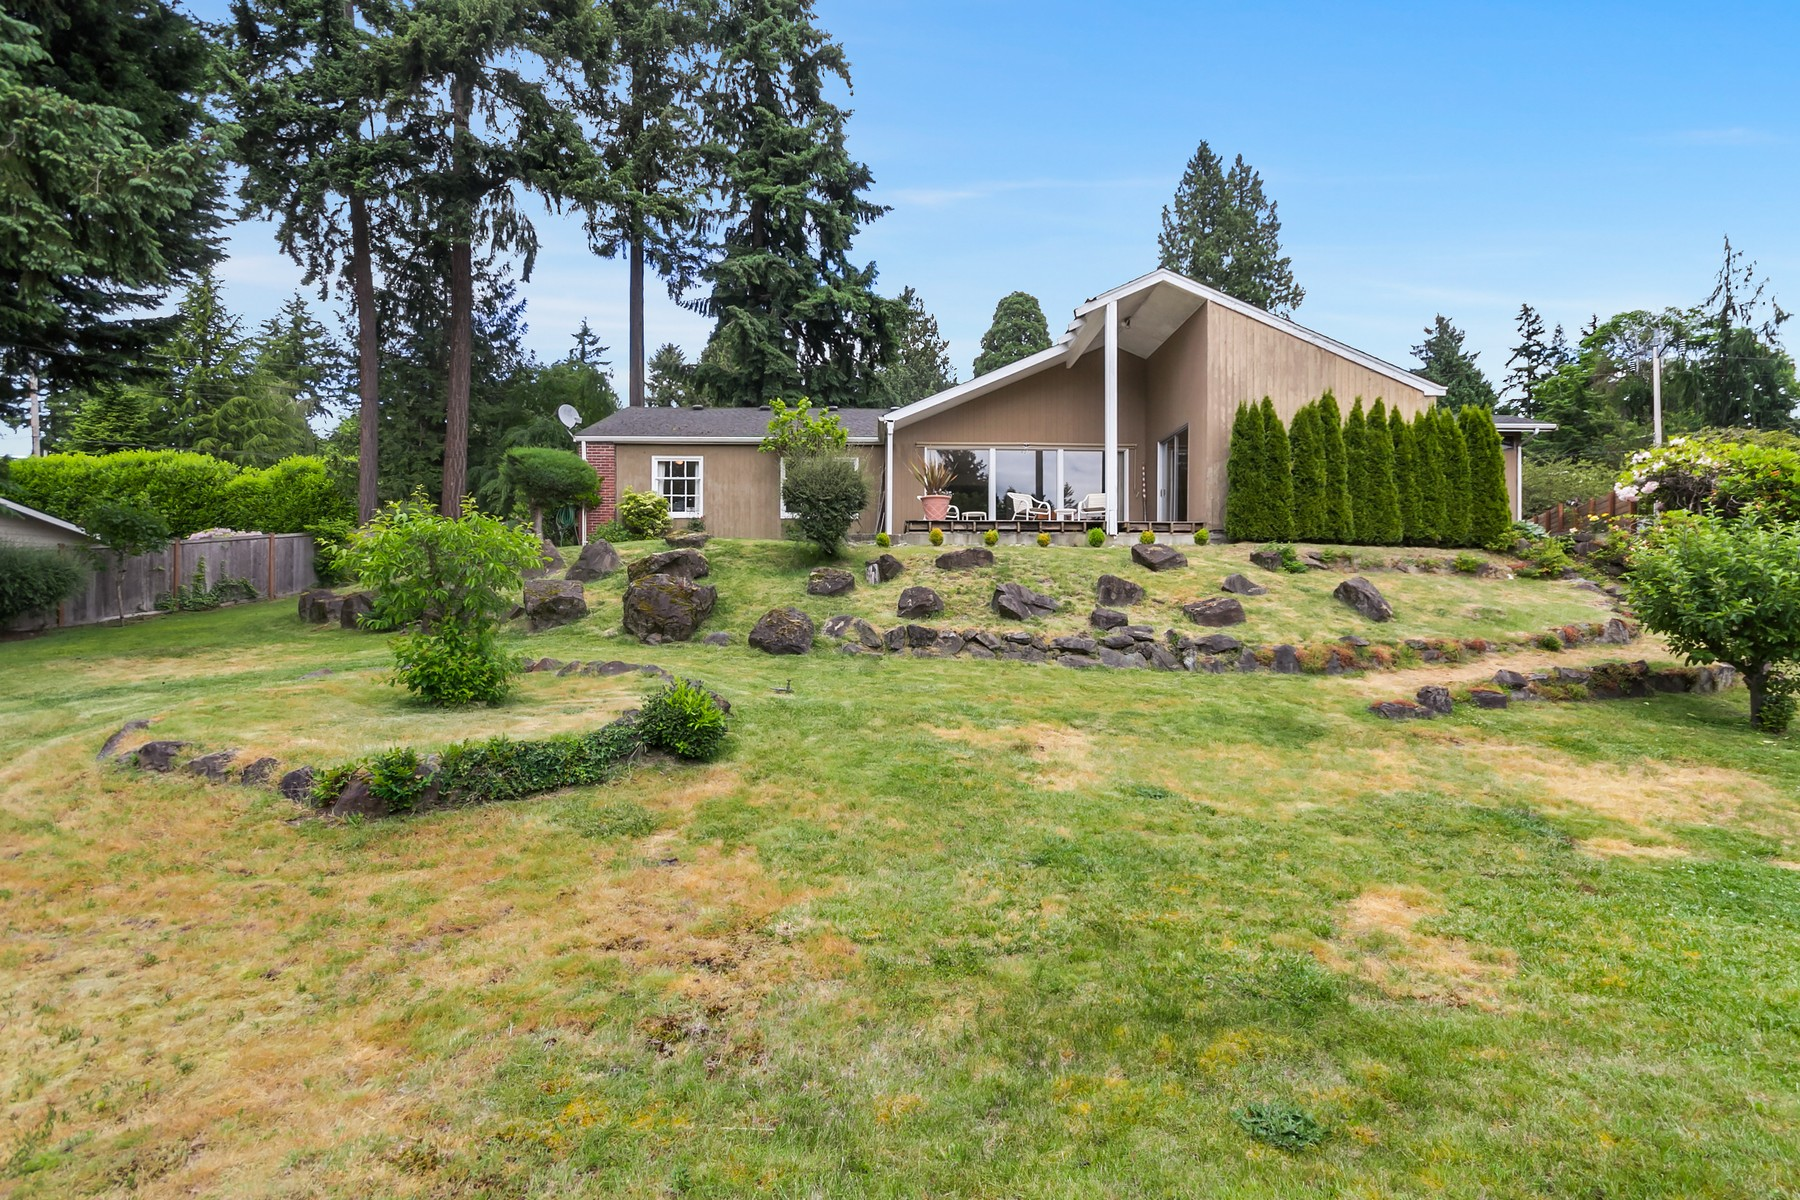 Single Family Home for Sale at Bellevue/Cunninghams Home 8923 NE 1st St Bellevue, Washington, 98004 United States